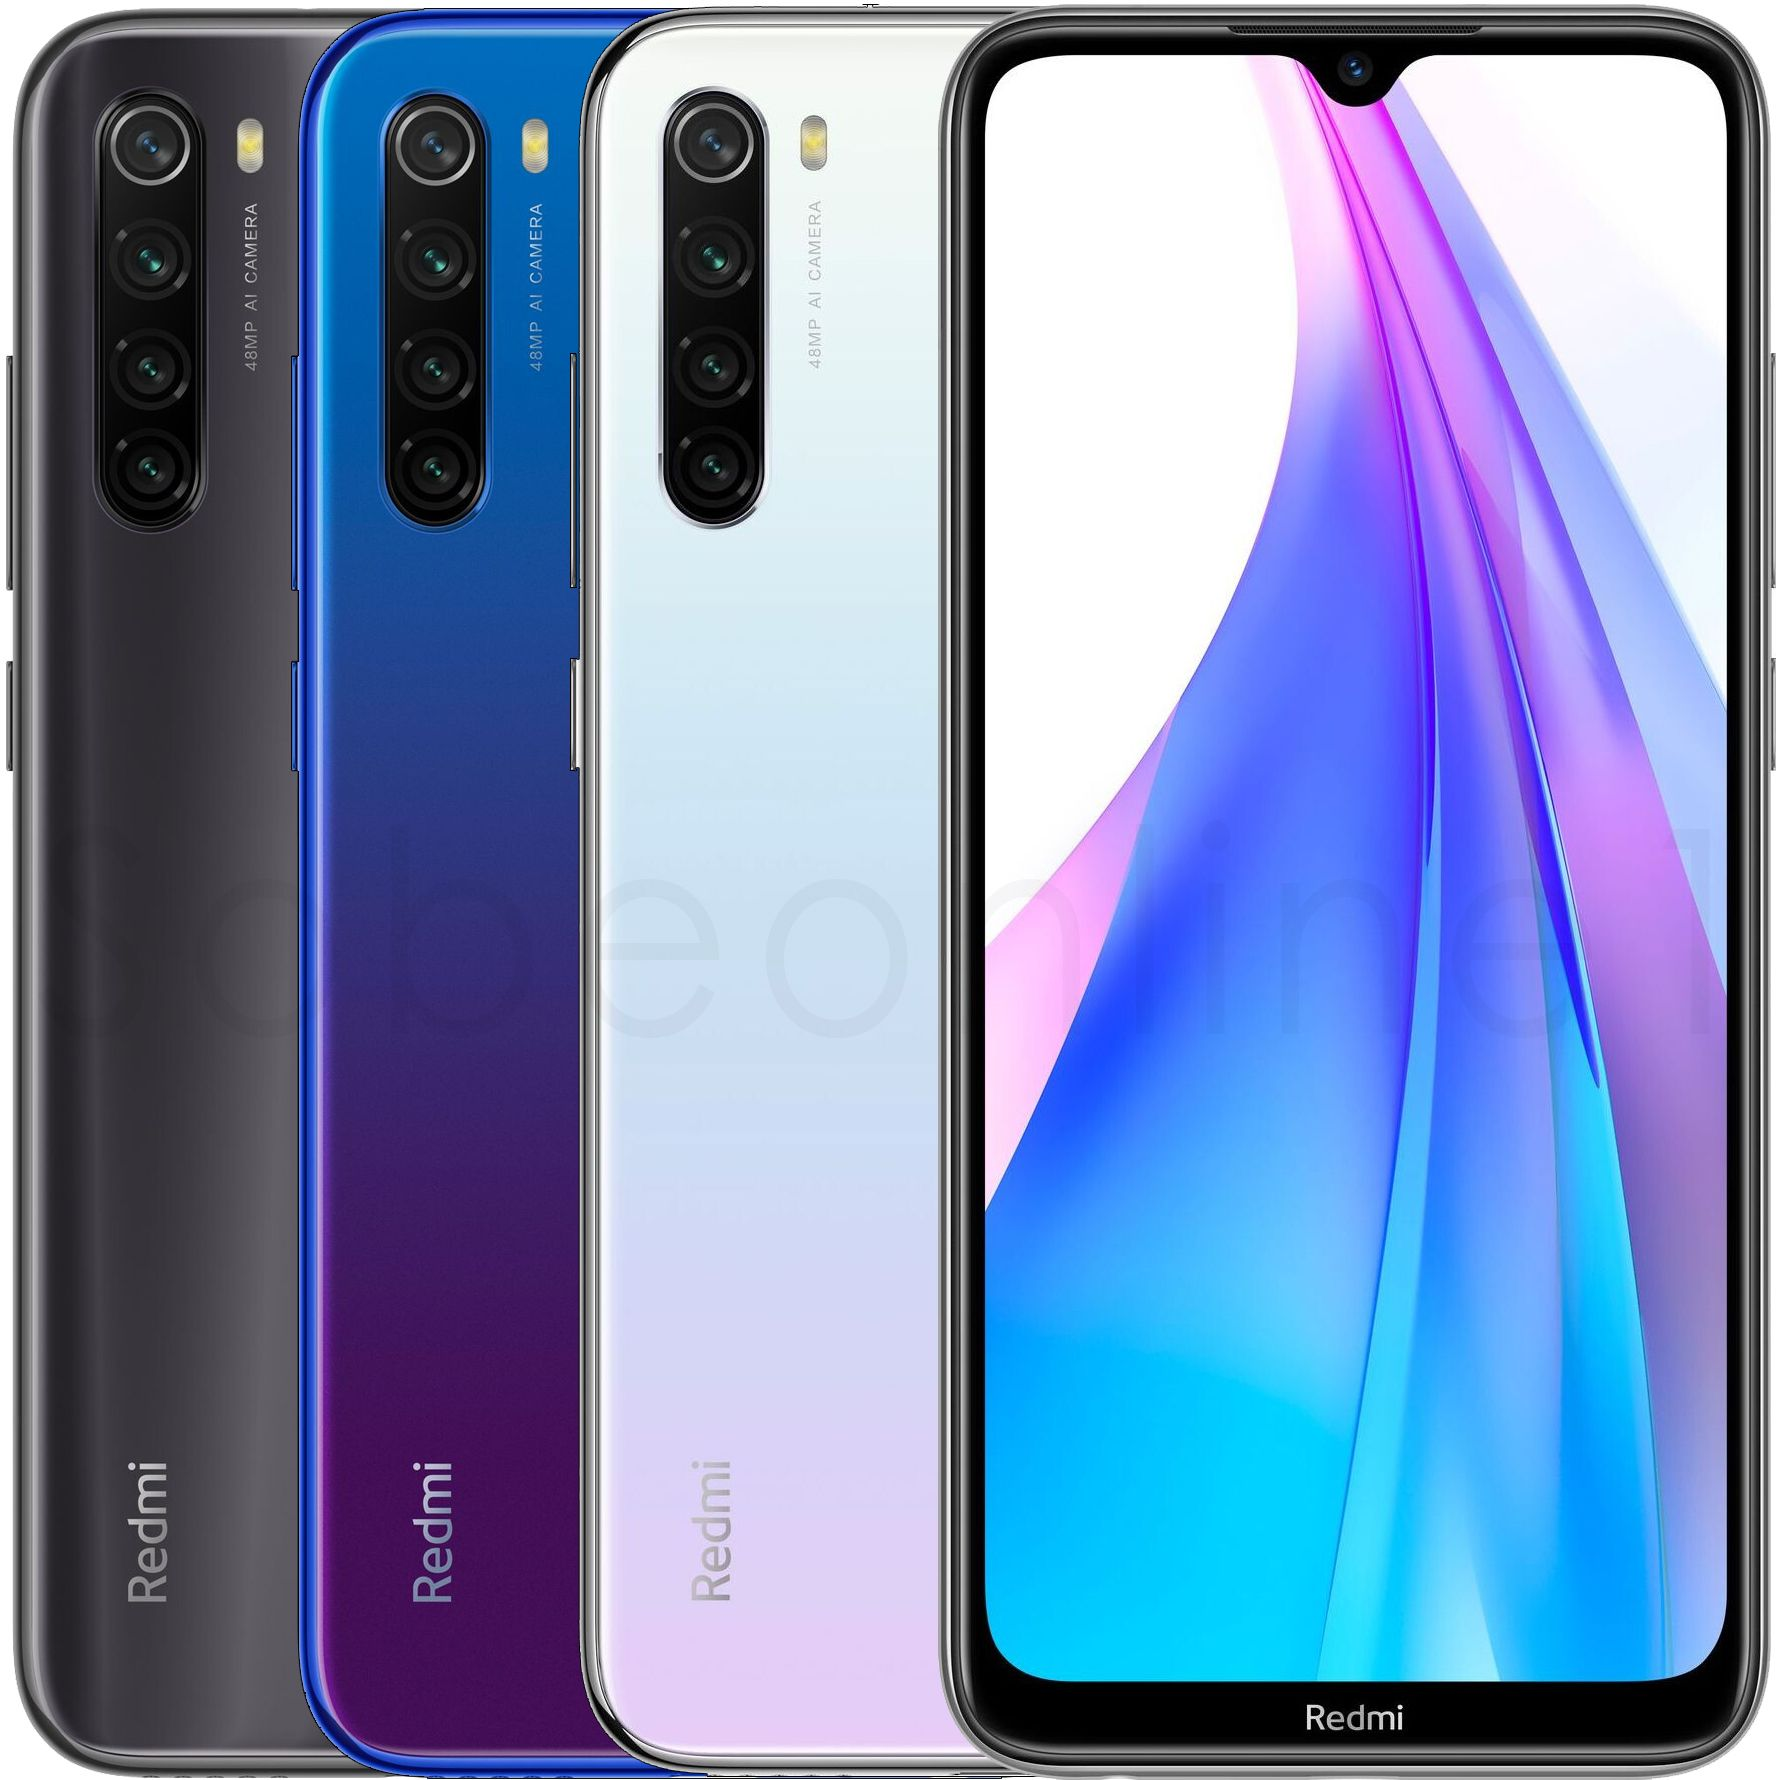 Xiaomi Redmi Note 8t 64gb 4gb Ram 6 3 48mp Factory Unlocked Dual Sim Global In 2020 Xiaomi Iphone Offers Dual Sim